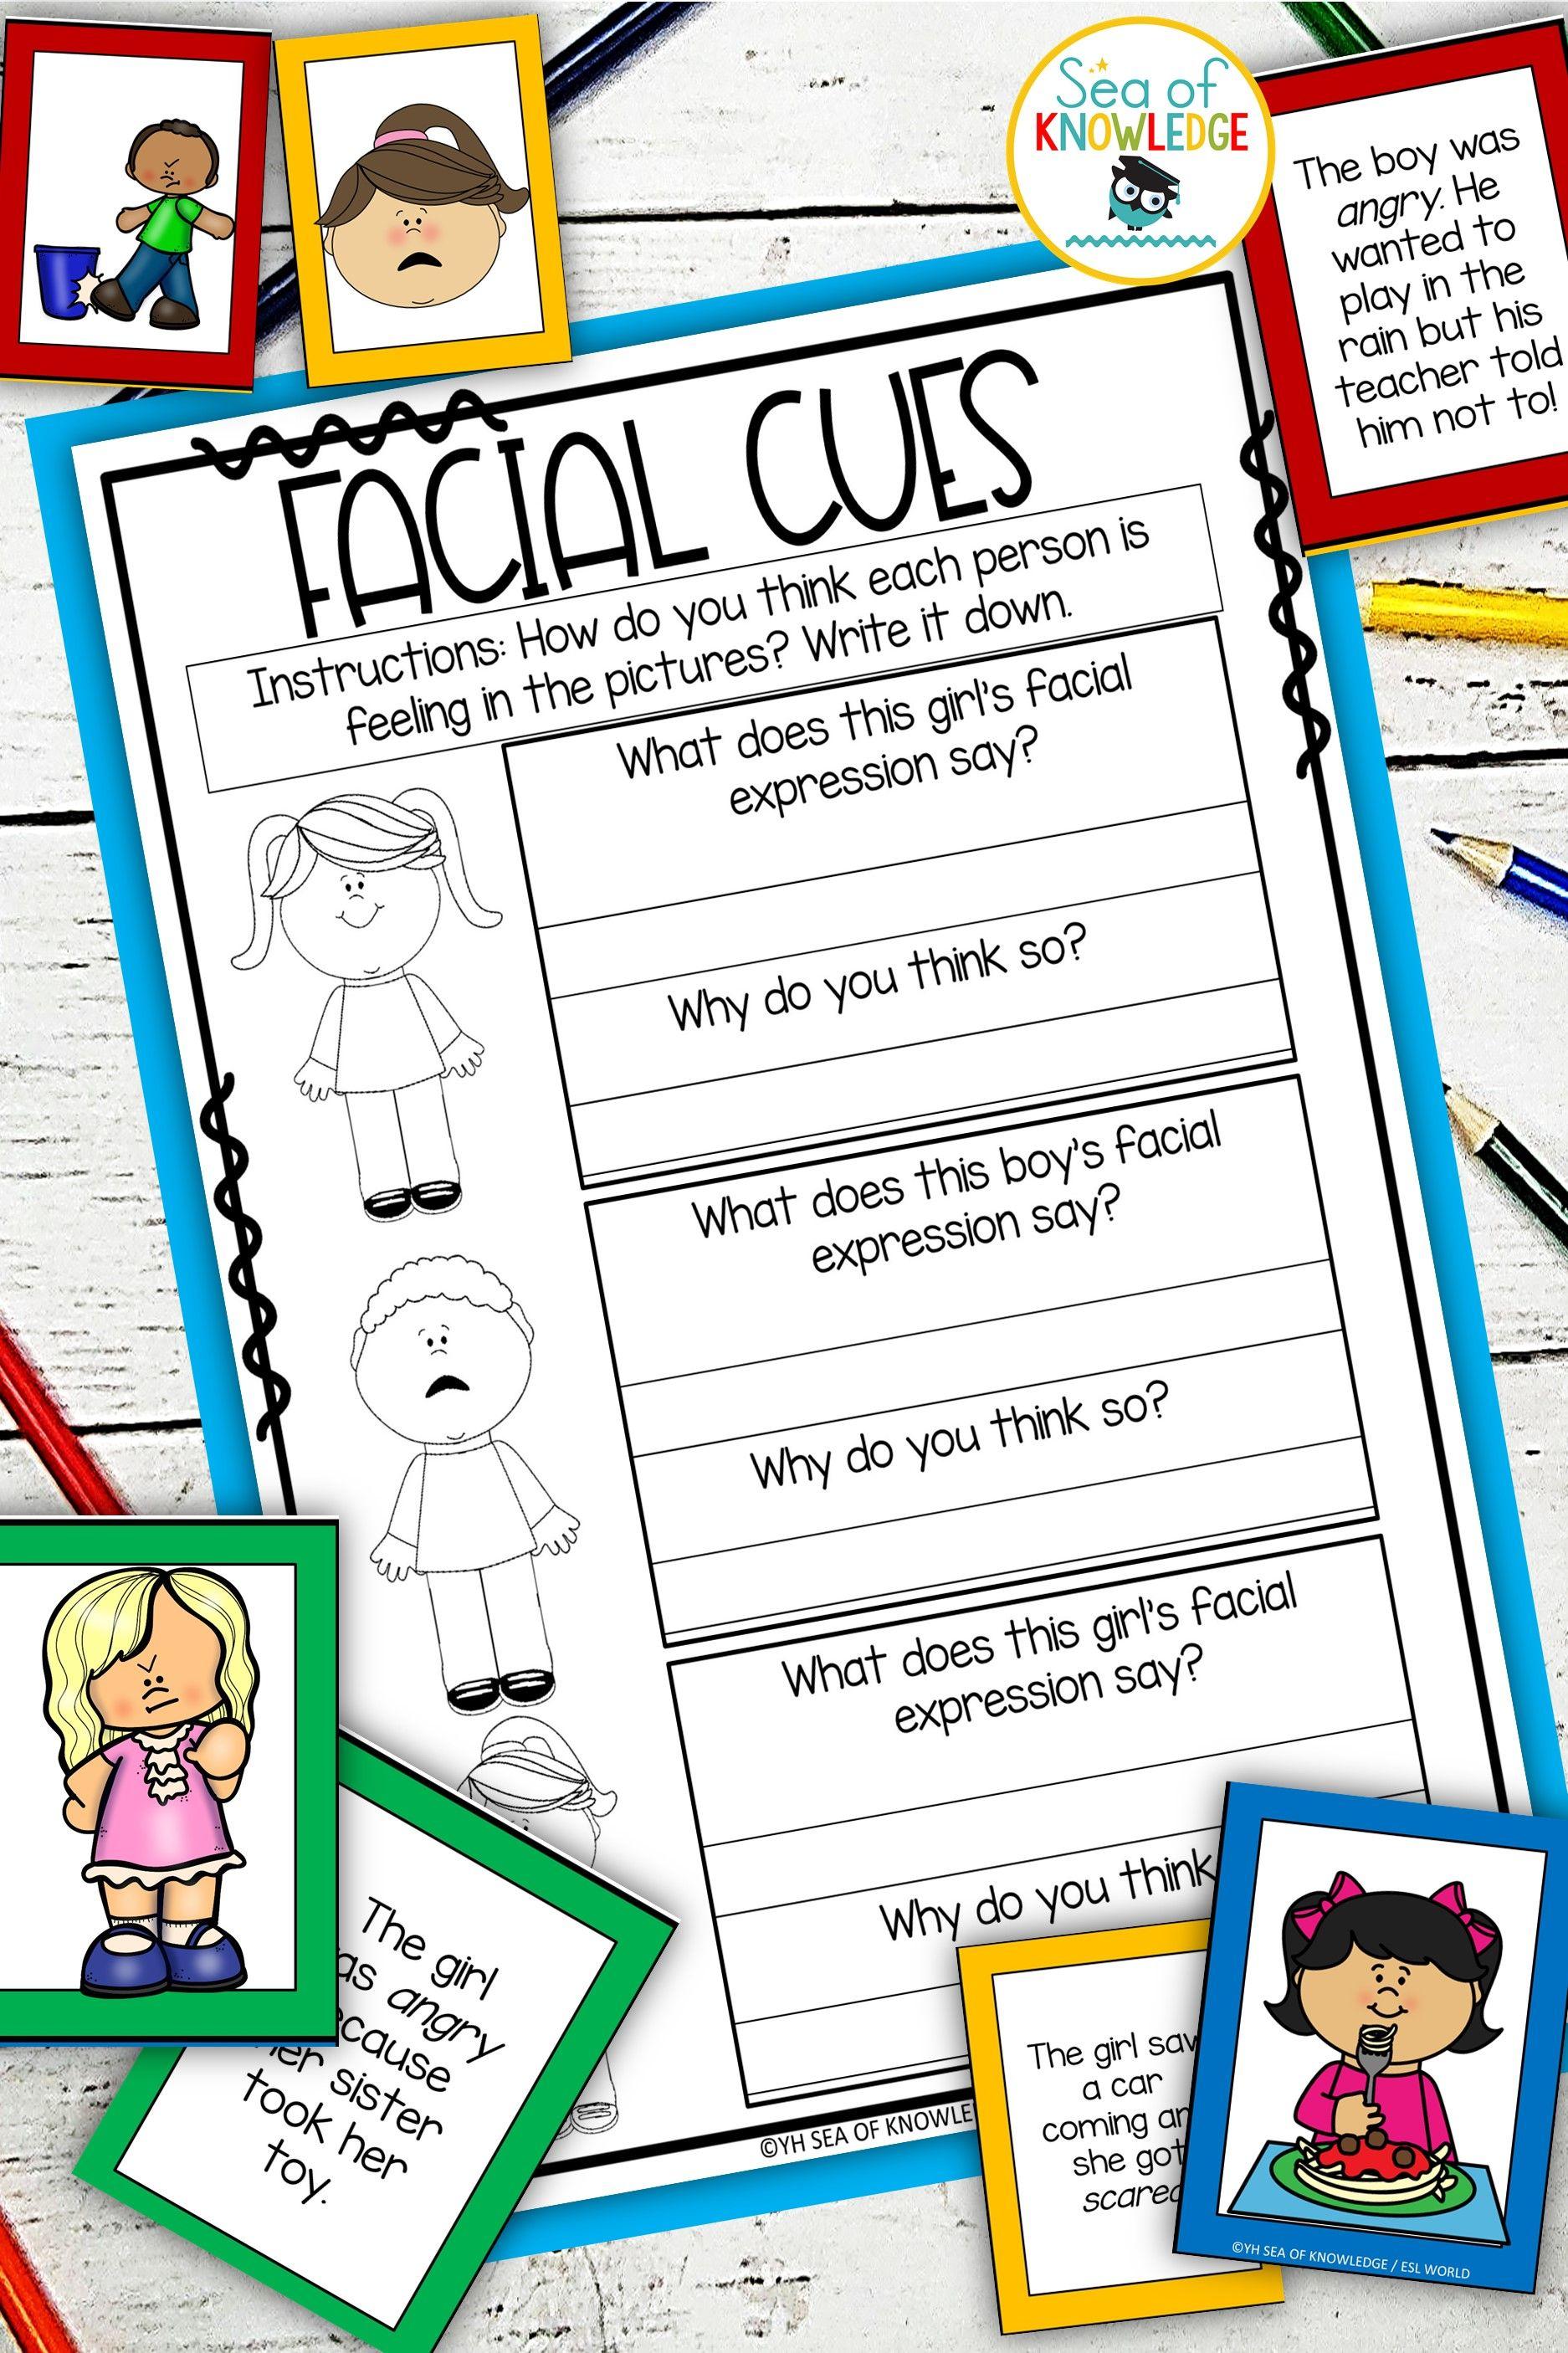 Social Skills For Kids Activities Social Skills Lessons Teaching Social Skills Social Skills For Kids